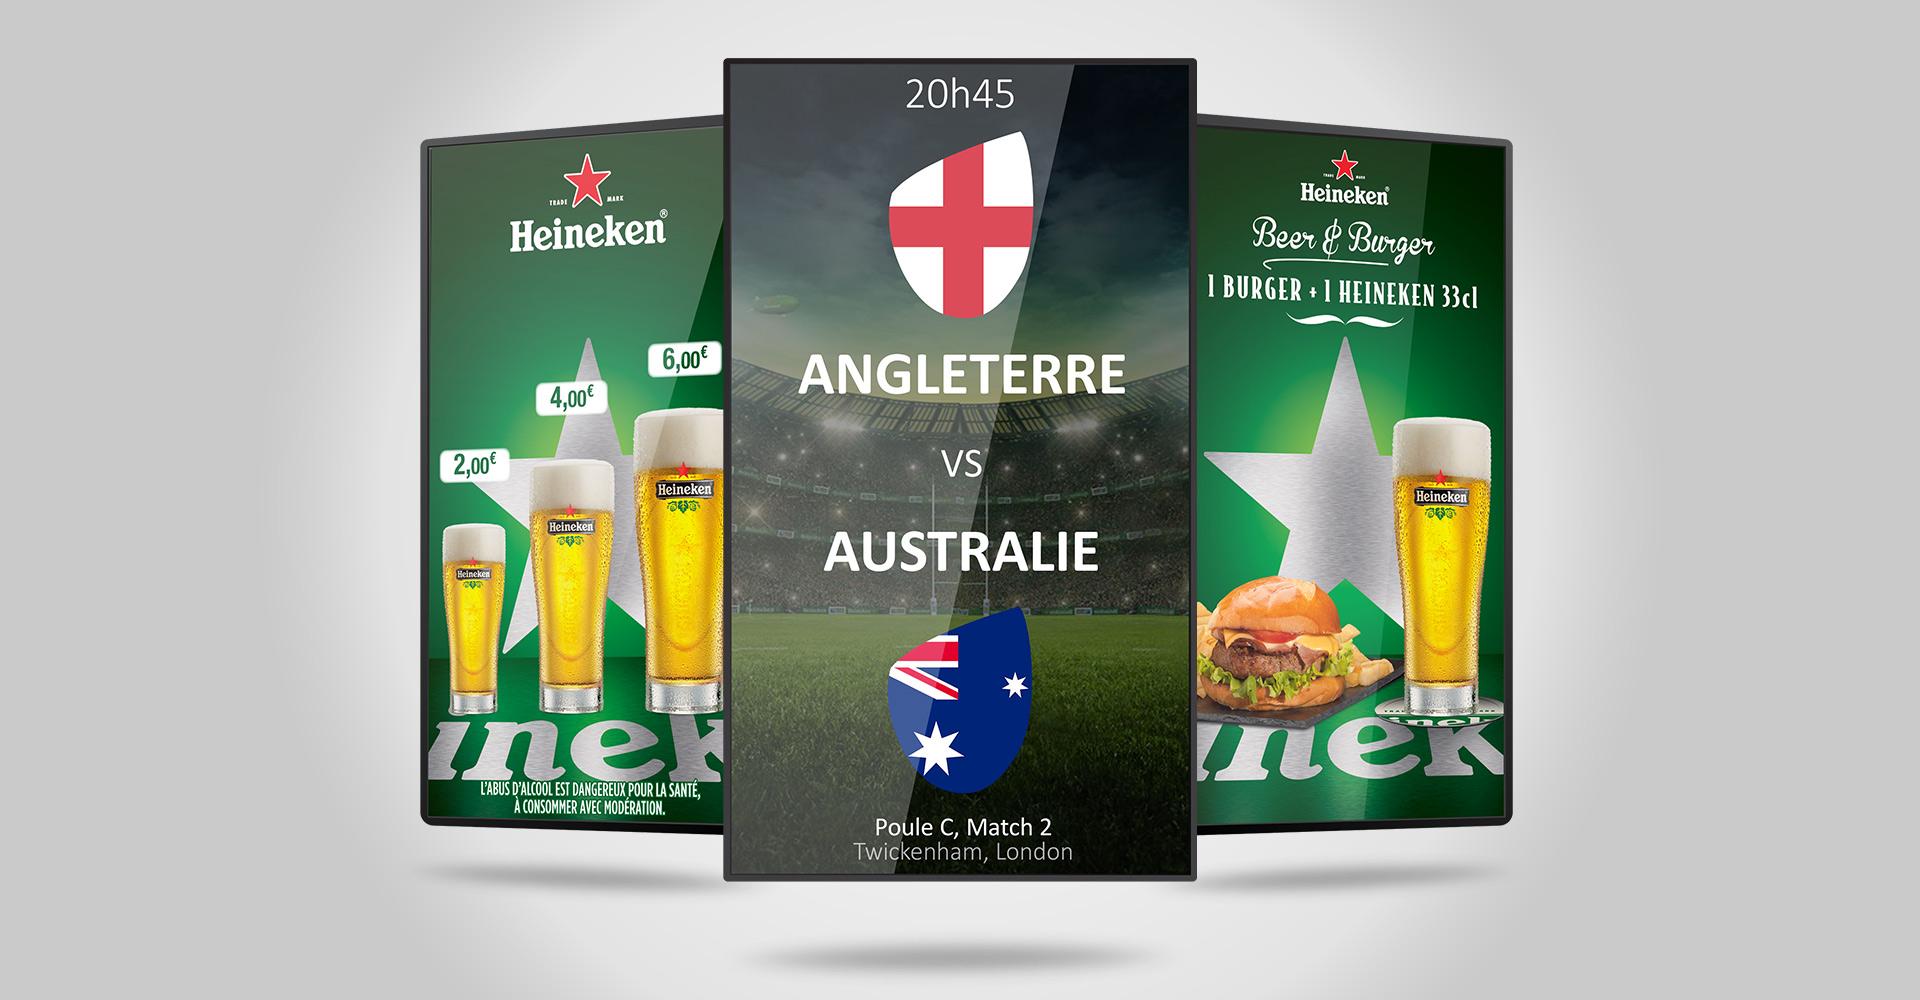 affichage dynamique en magasin Heineken